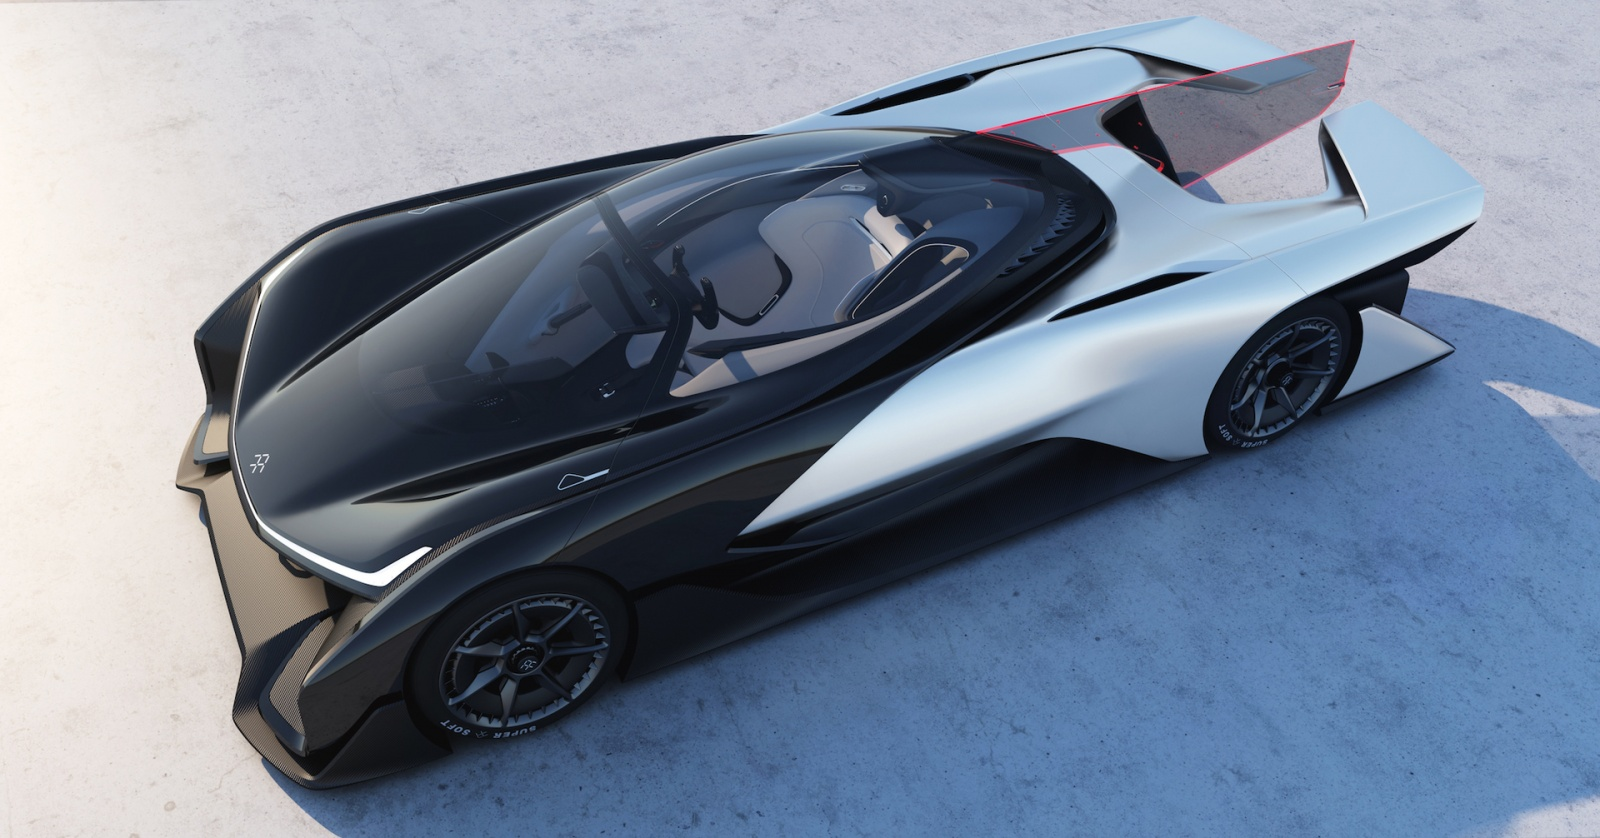 Faraday Future представила концепт модульной платформы электромобилей и суперкар FFZERO1 - 2